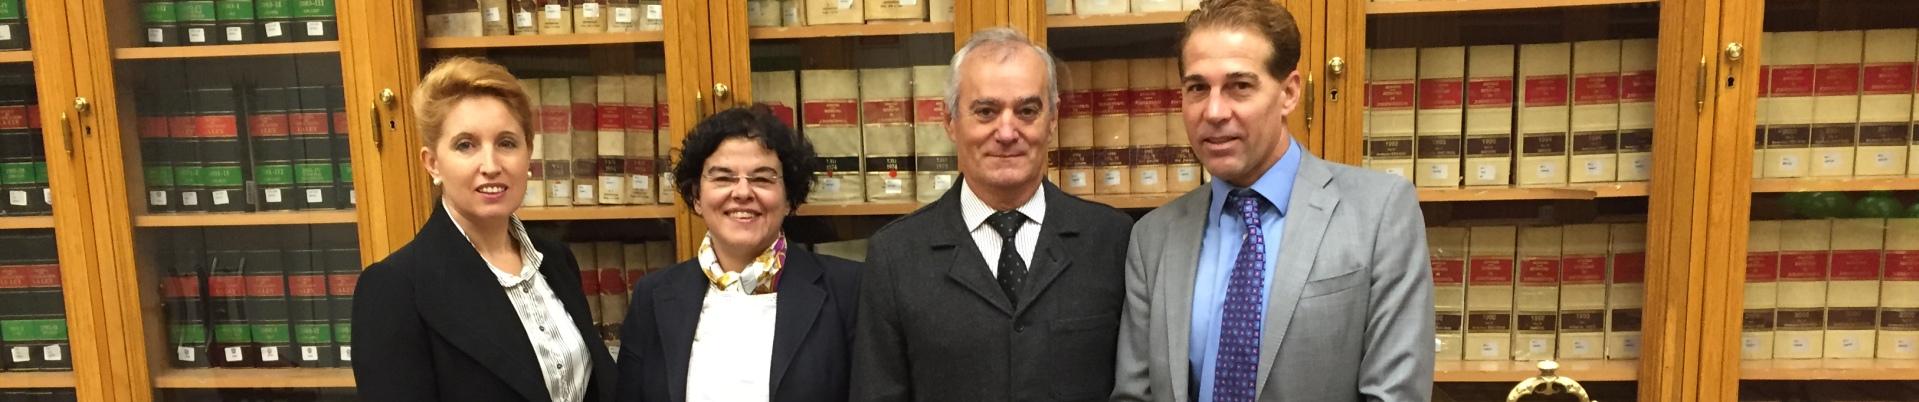 Asistencia jurídica profesional